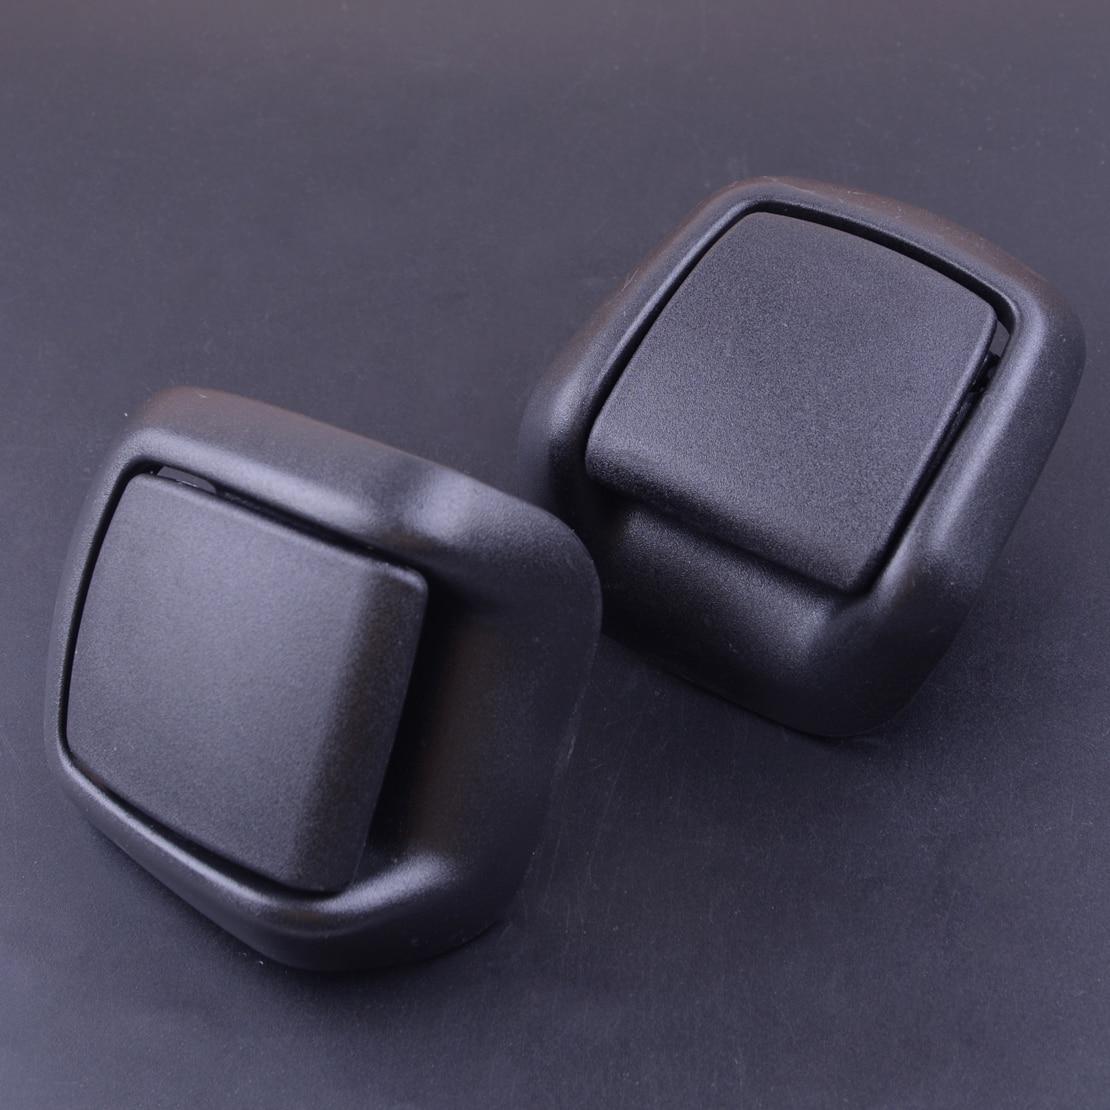 Beler 1Pair Plastic Front Right Left Seat Tilt Handle Fit For Ford Fiesta MK6 VI 3 Door 2002-2005 2006 2007 2008 1417520 1417521